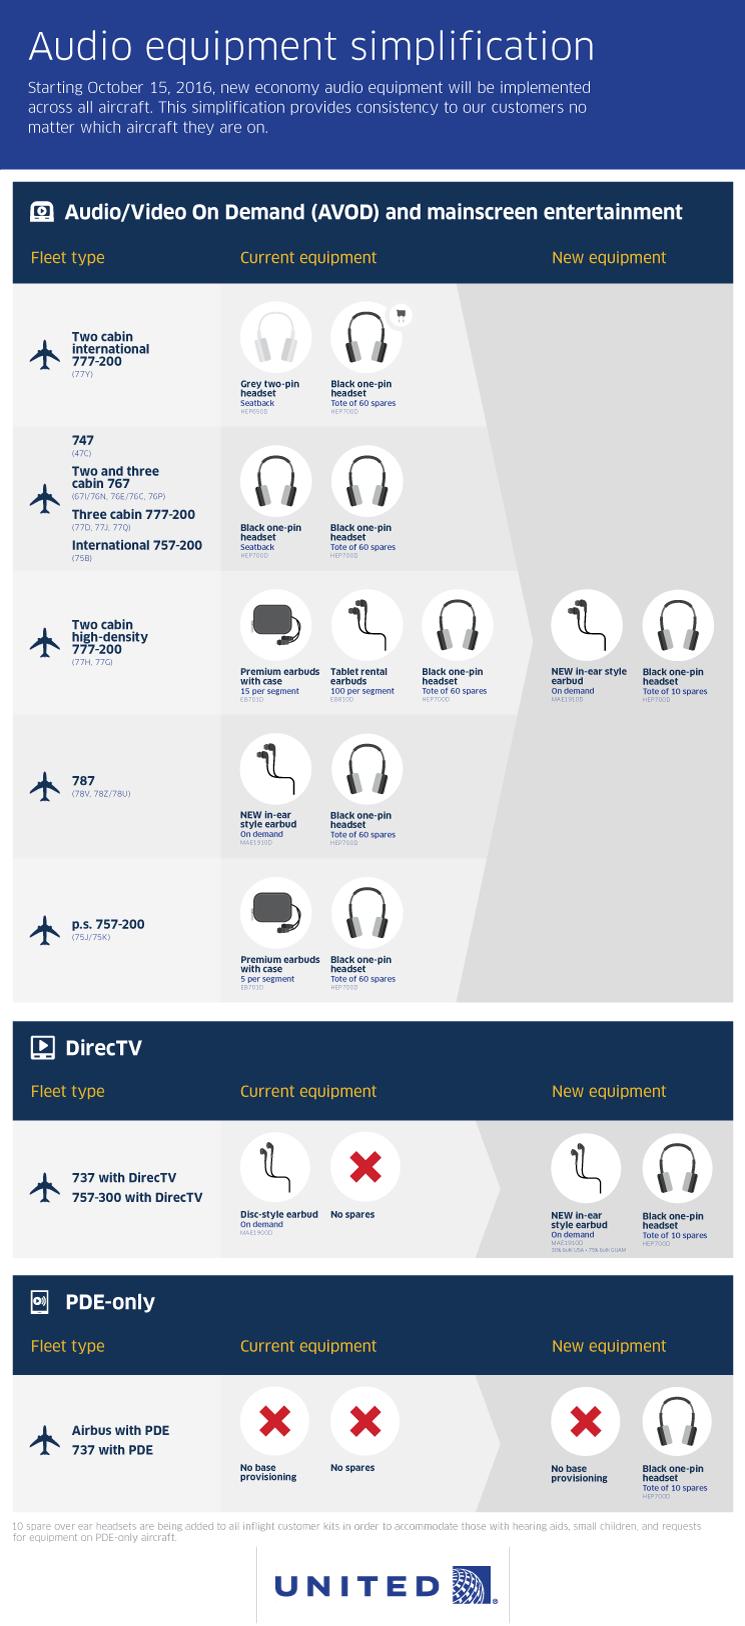 26160_Audio-Infographic_v8a